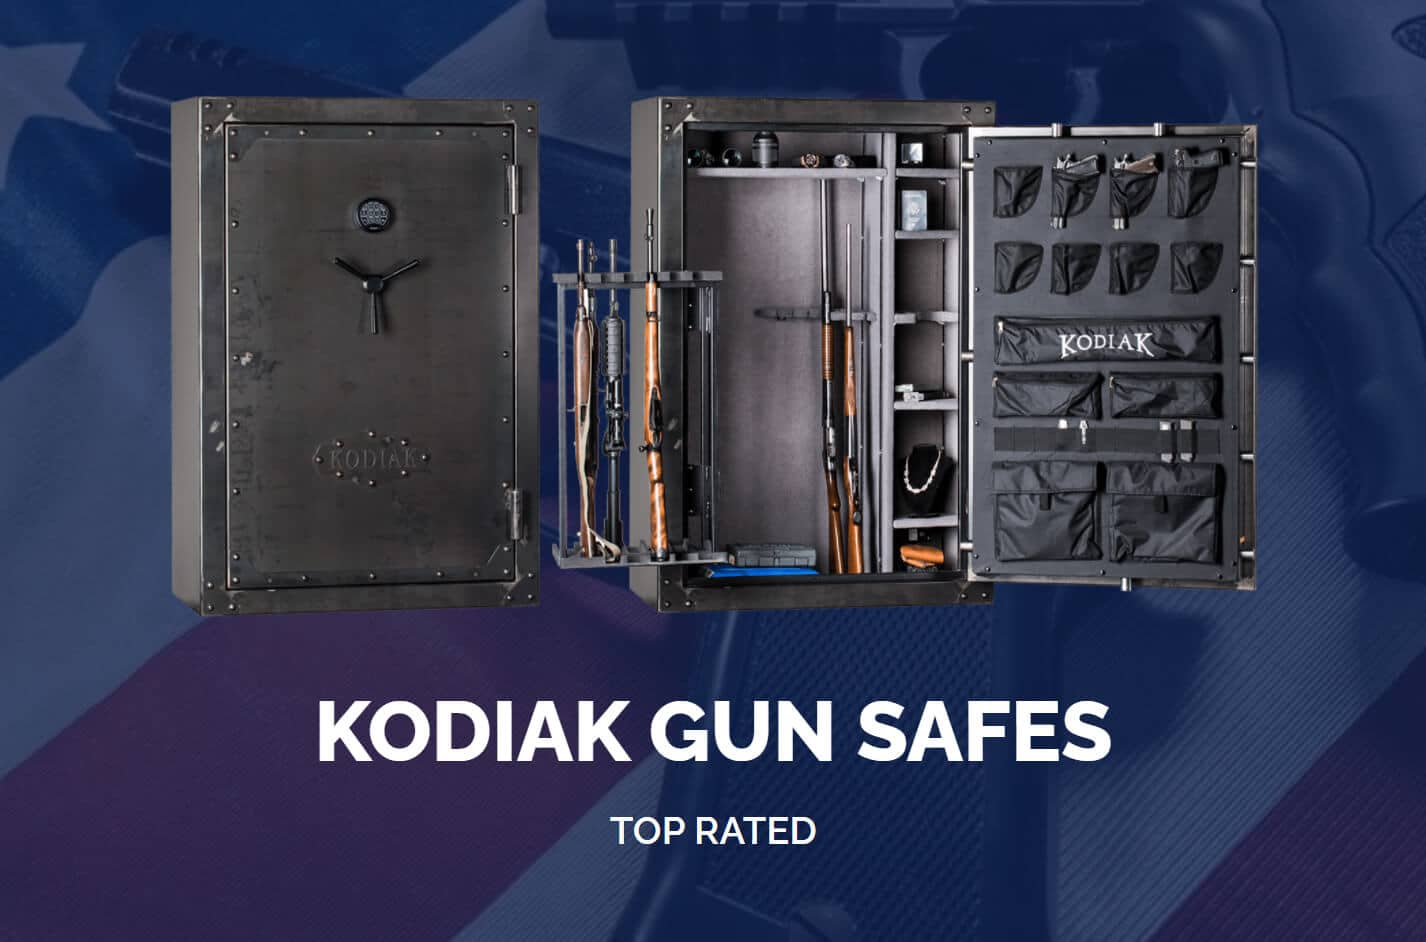 kodiak gun safes